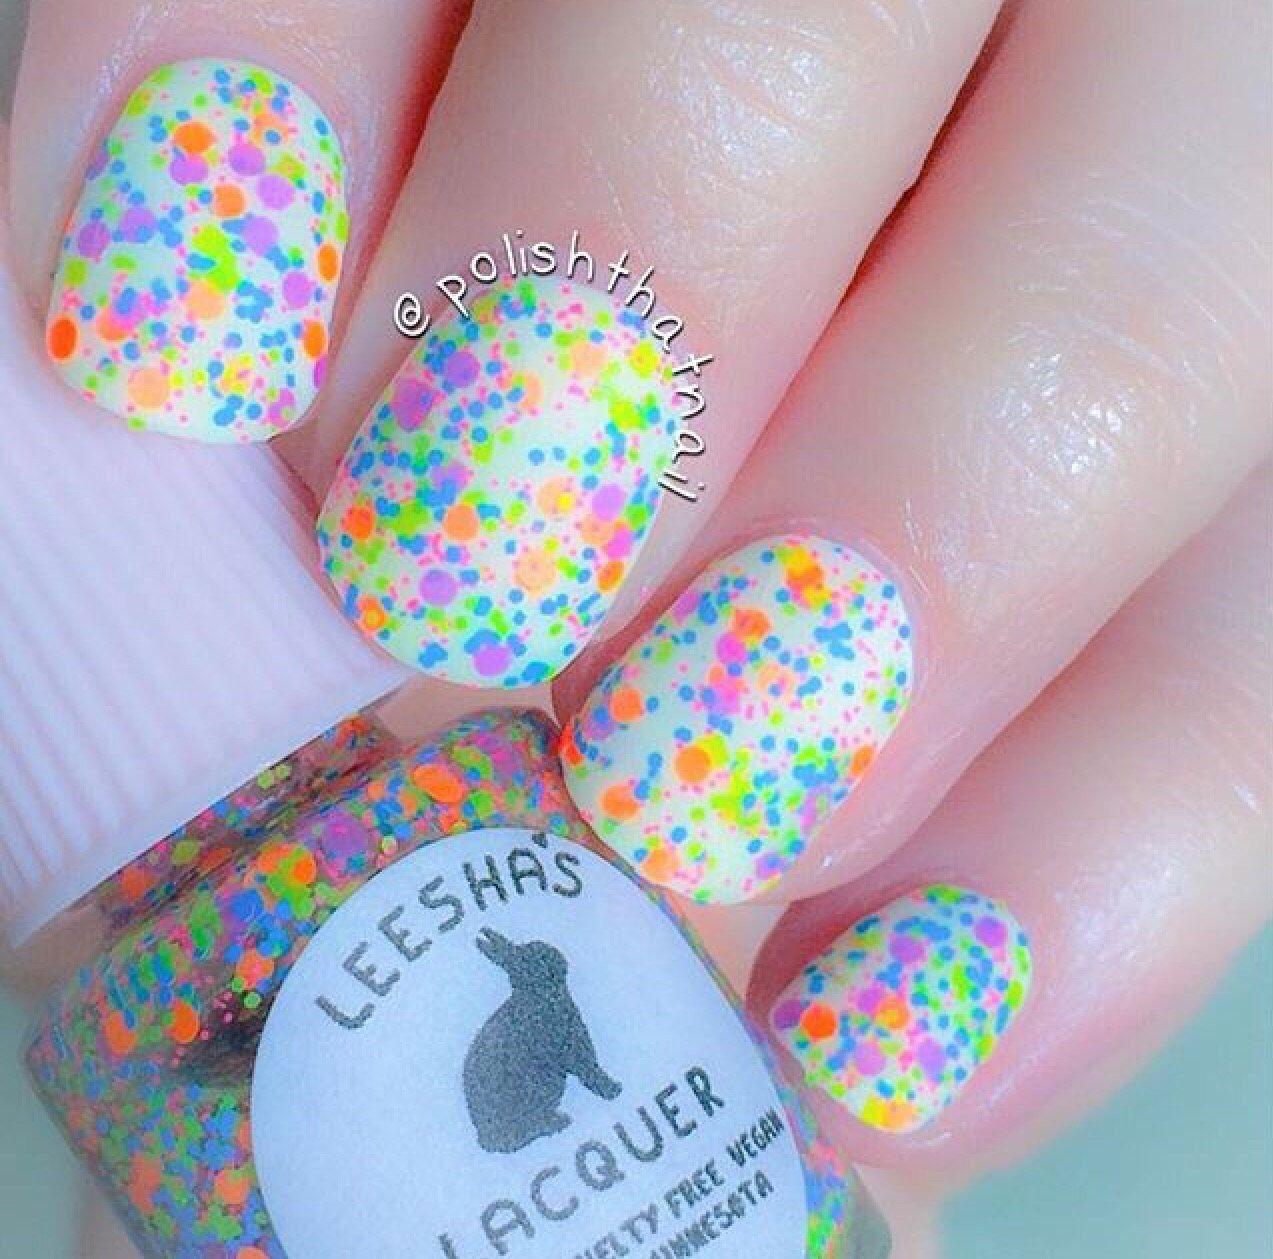 Pin by Maggie Smith on Girl Stuff | Pinterest | Glitter nail polish ...